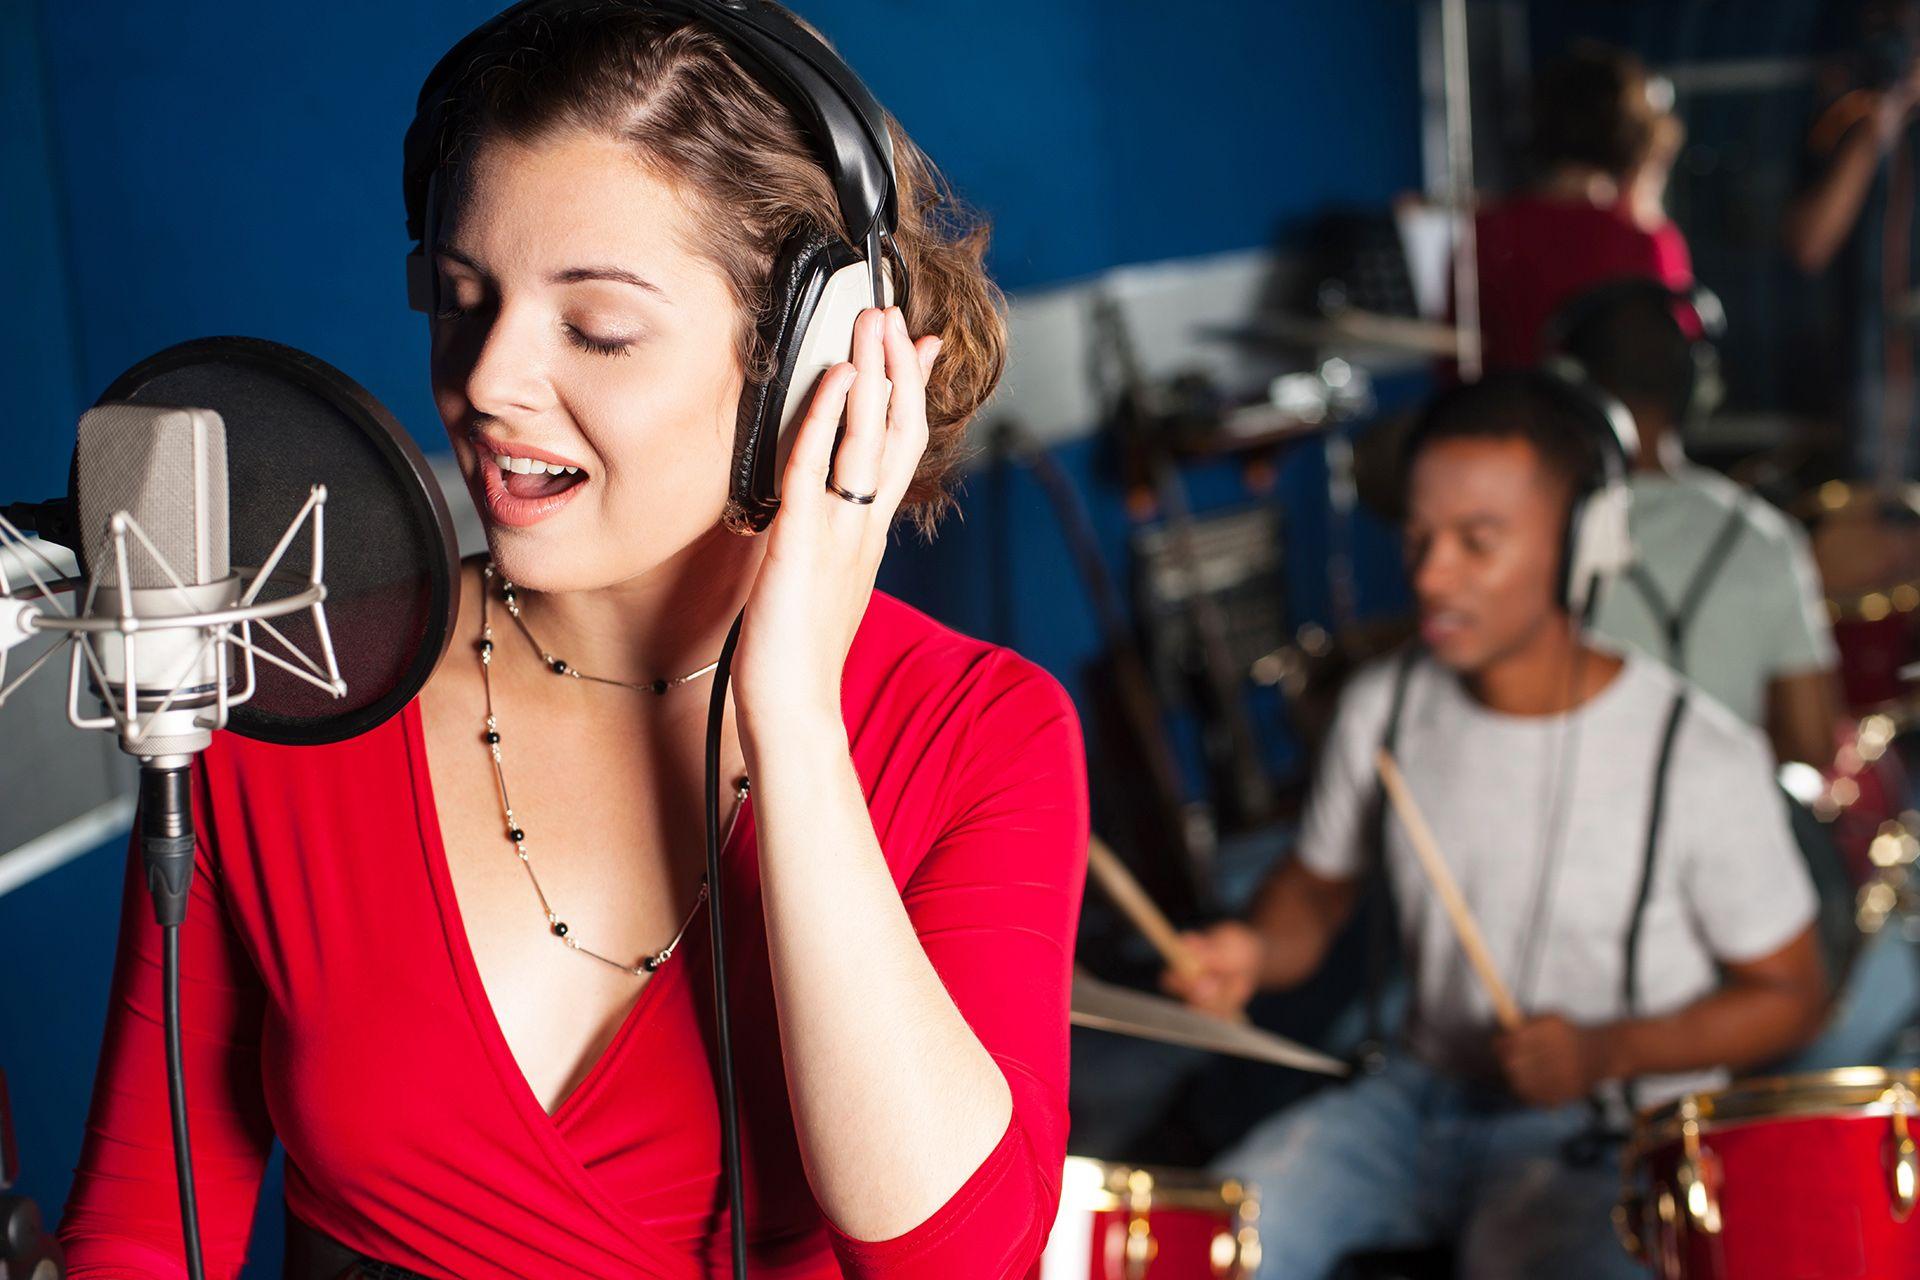 Eigene Cd In Tonstudio Aufnehmen Ab 25 Be A Popstar